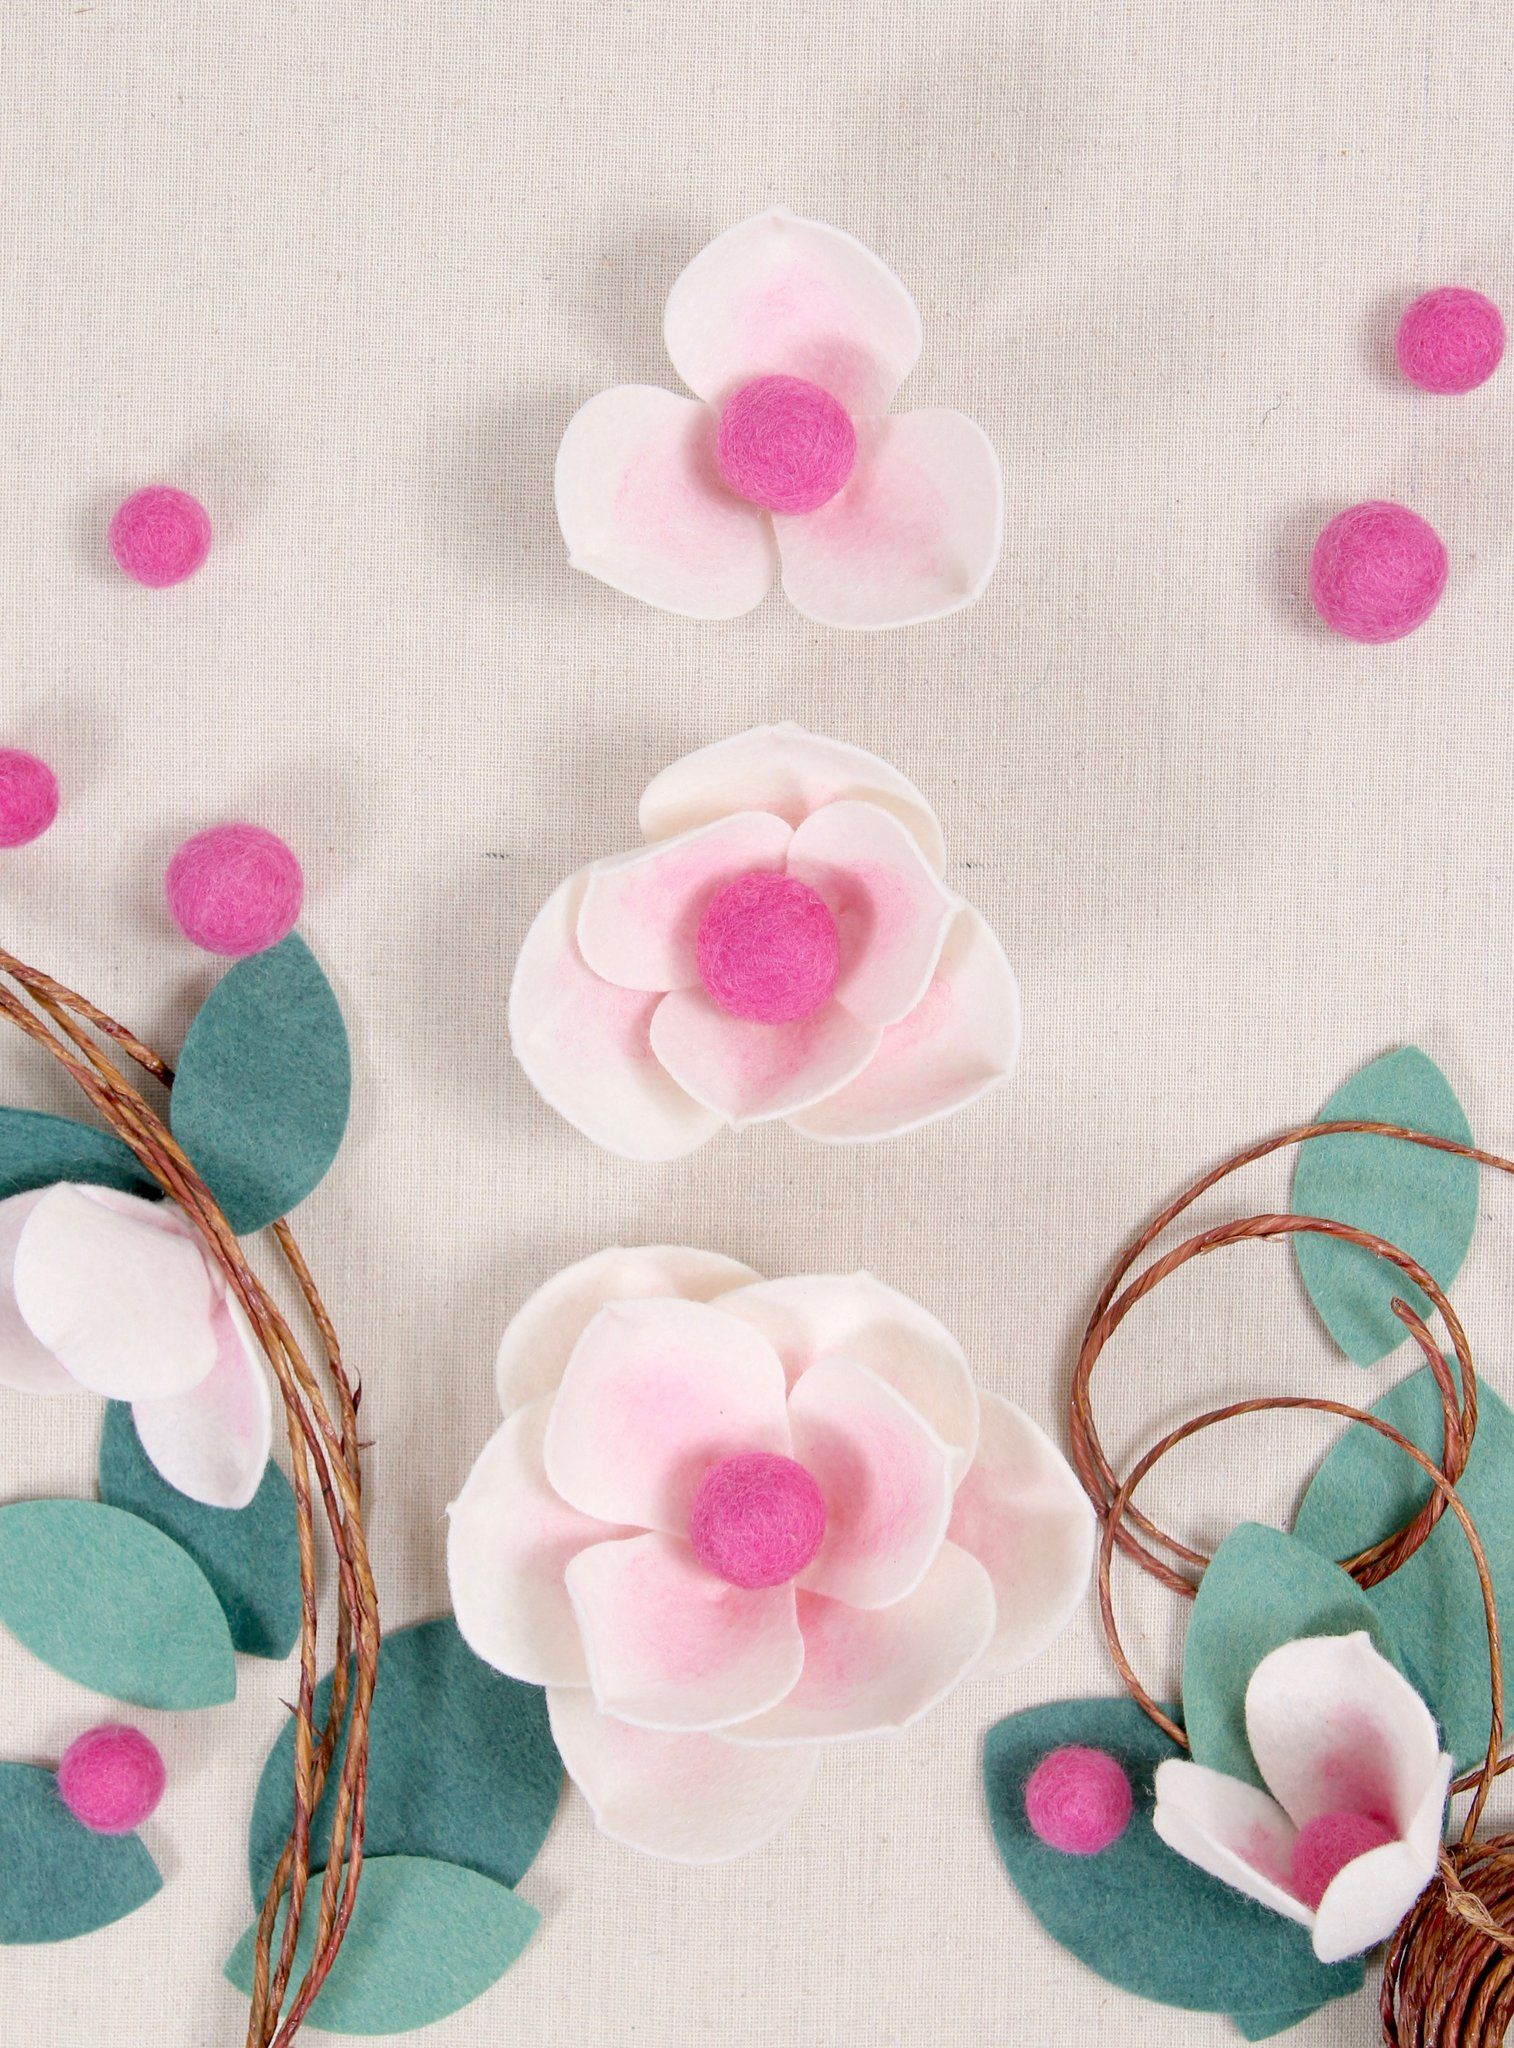 Felt Flowers Diy Felt Flowers Patterns Felt Flowers Felt